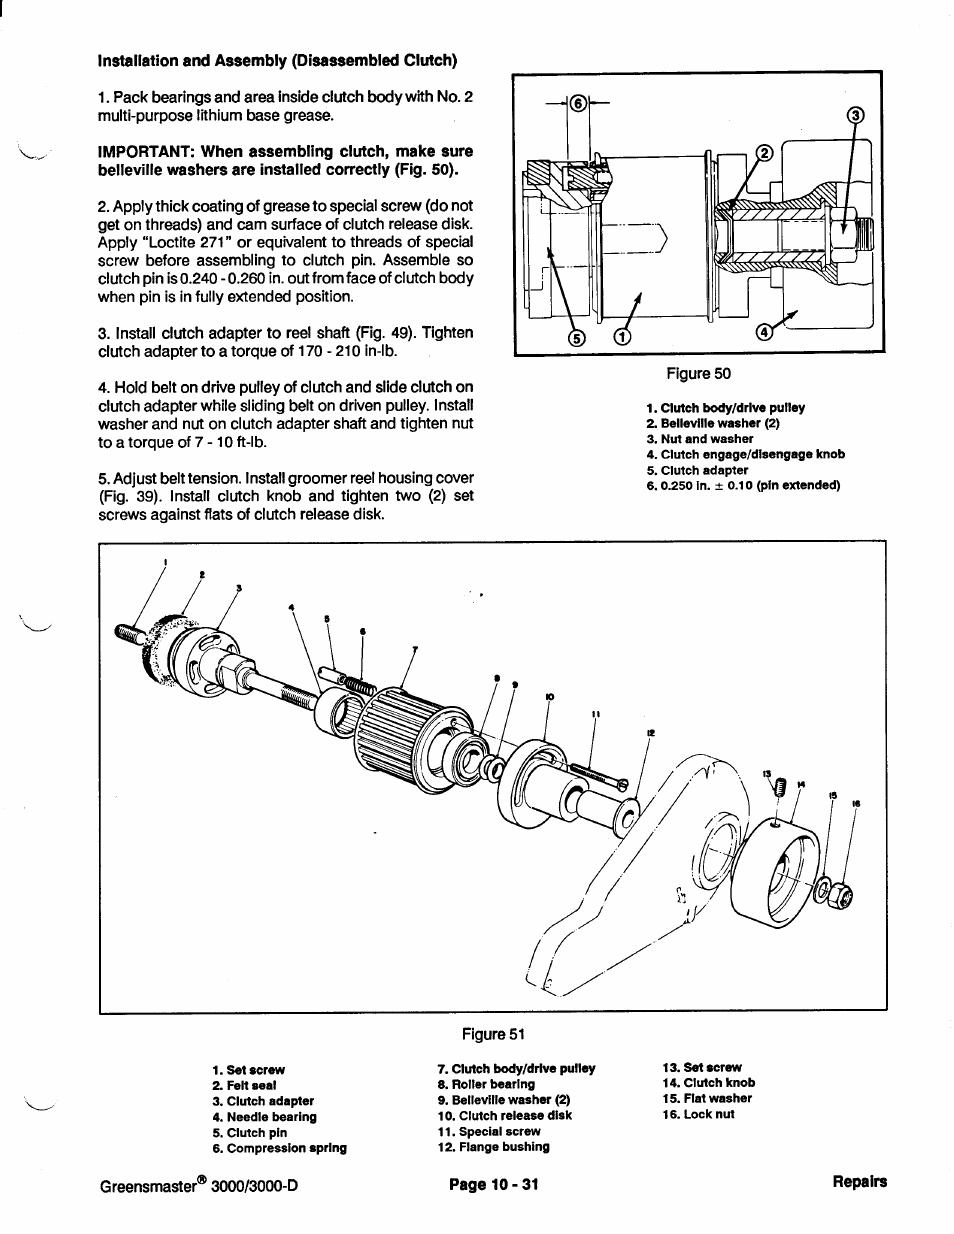 Manual Ihc 656 Ebook 2001 Datsun Frontier Xe Passenger Fuse Box Diagram Array Cummins Ktta 50 Rh Topmalawis De